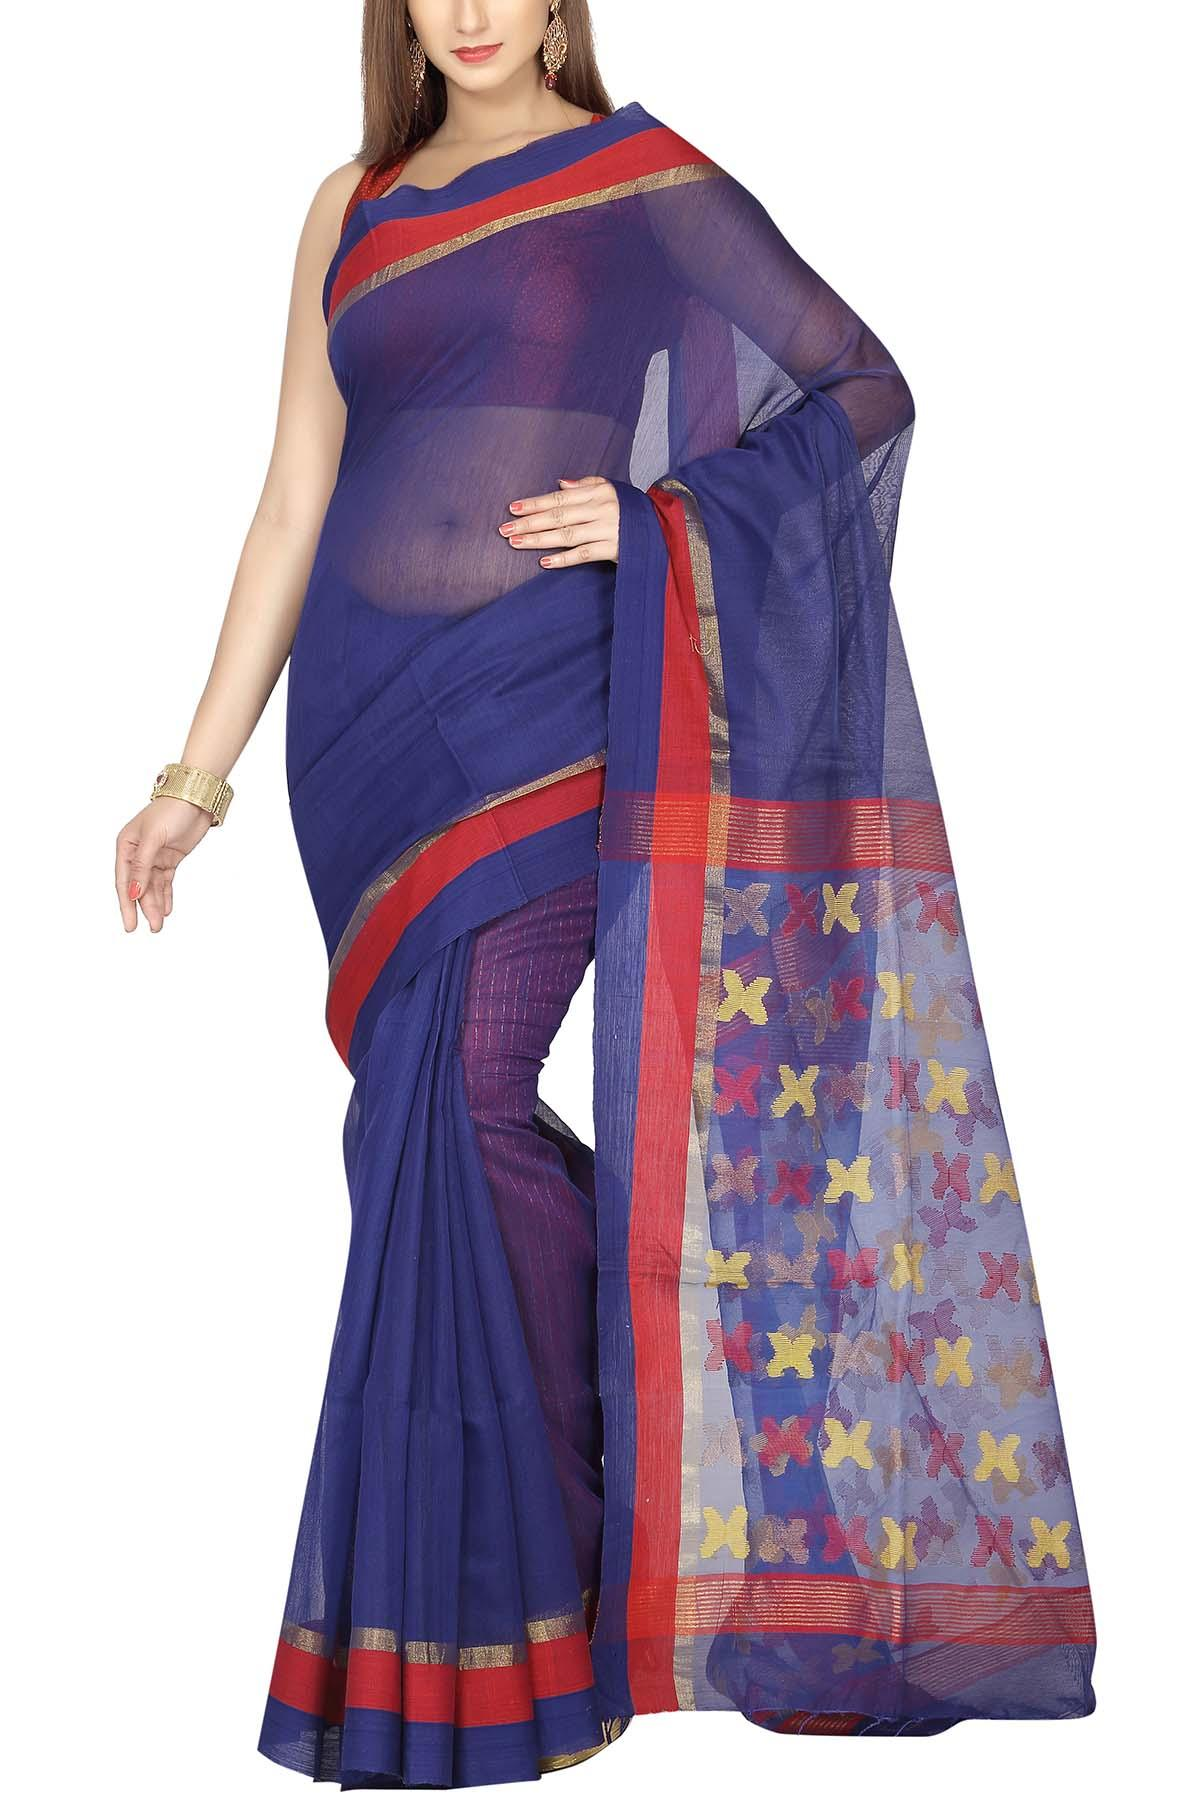 5cc99caf74 Royal Blue & Red Zari Dhakai Cotton Silk Jamdani Saree - Muslin ...